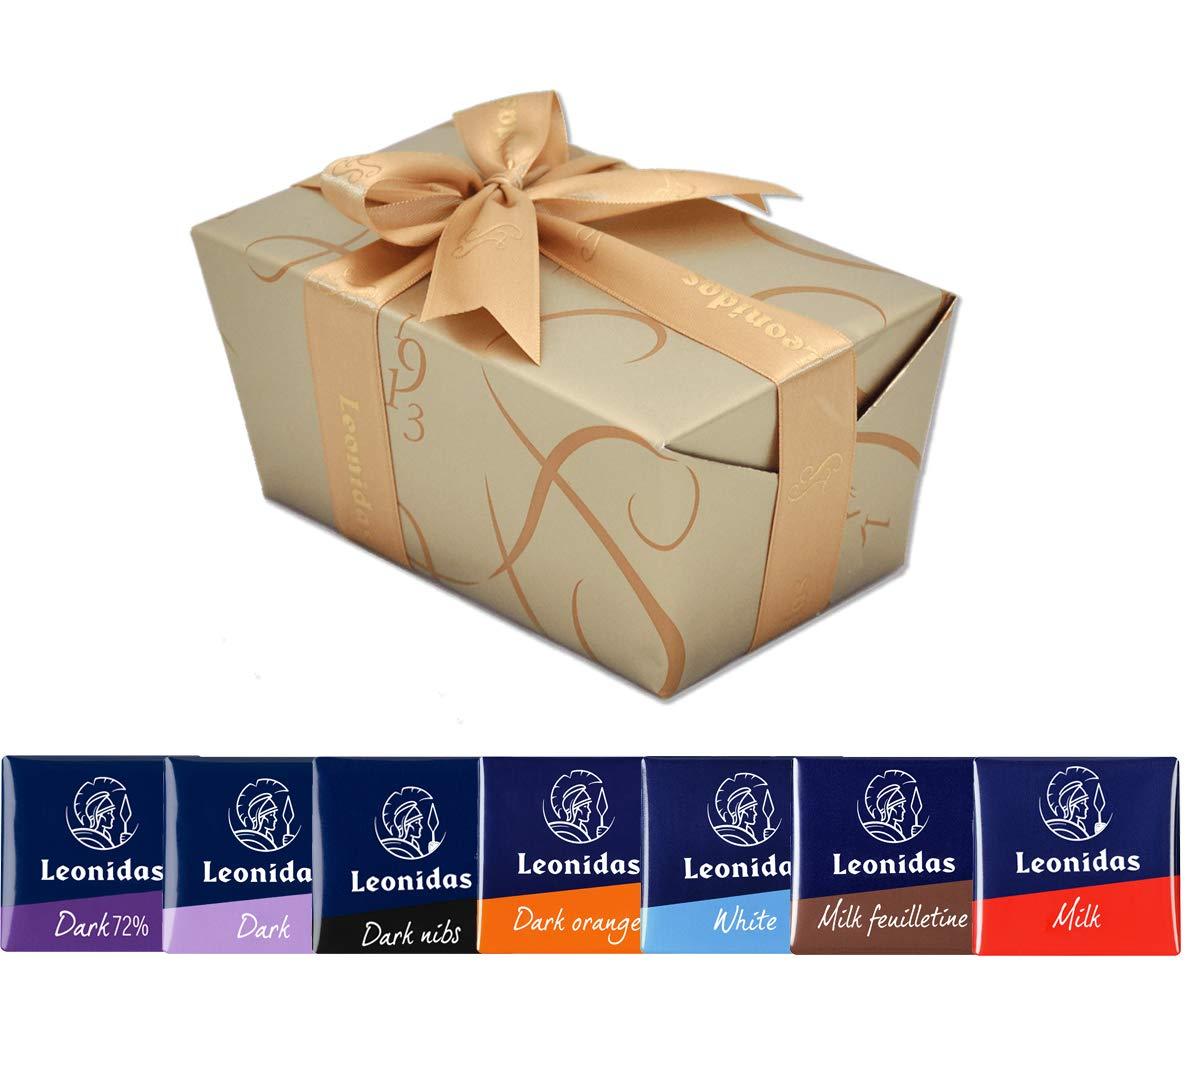 Leonidas Belgian Chocolates: 1 lb Napolitain Sampler Ballotin - Orange, Nibs, Feuilletine, Dark, Milk, and White Chocolate Squares by Leonidas Belgian Chocolates (Image #1)